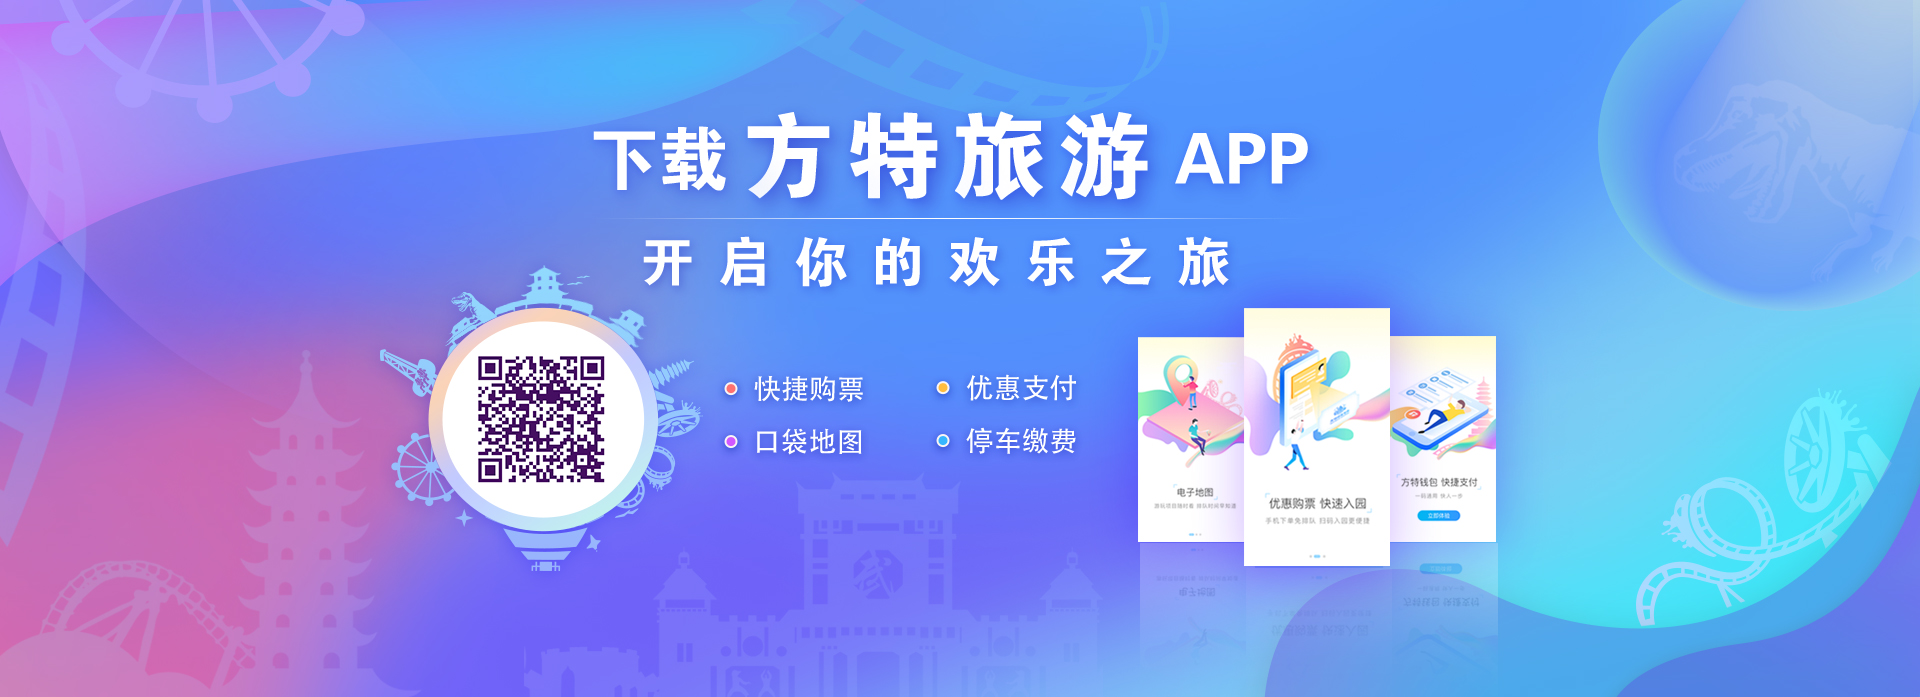 app宣传